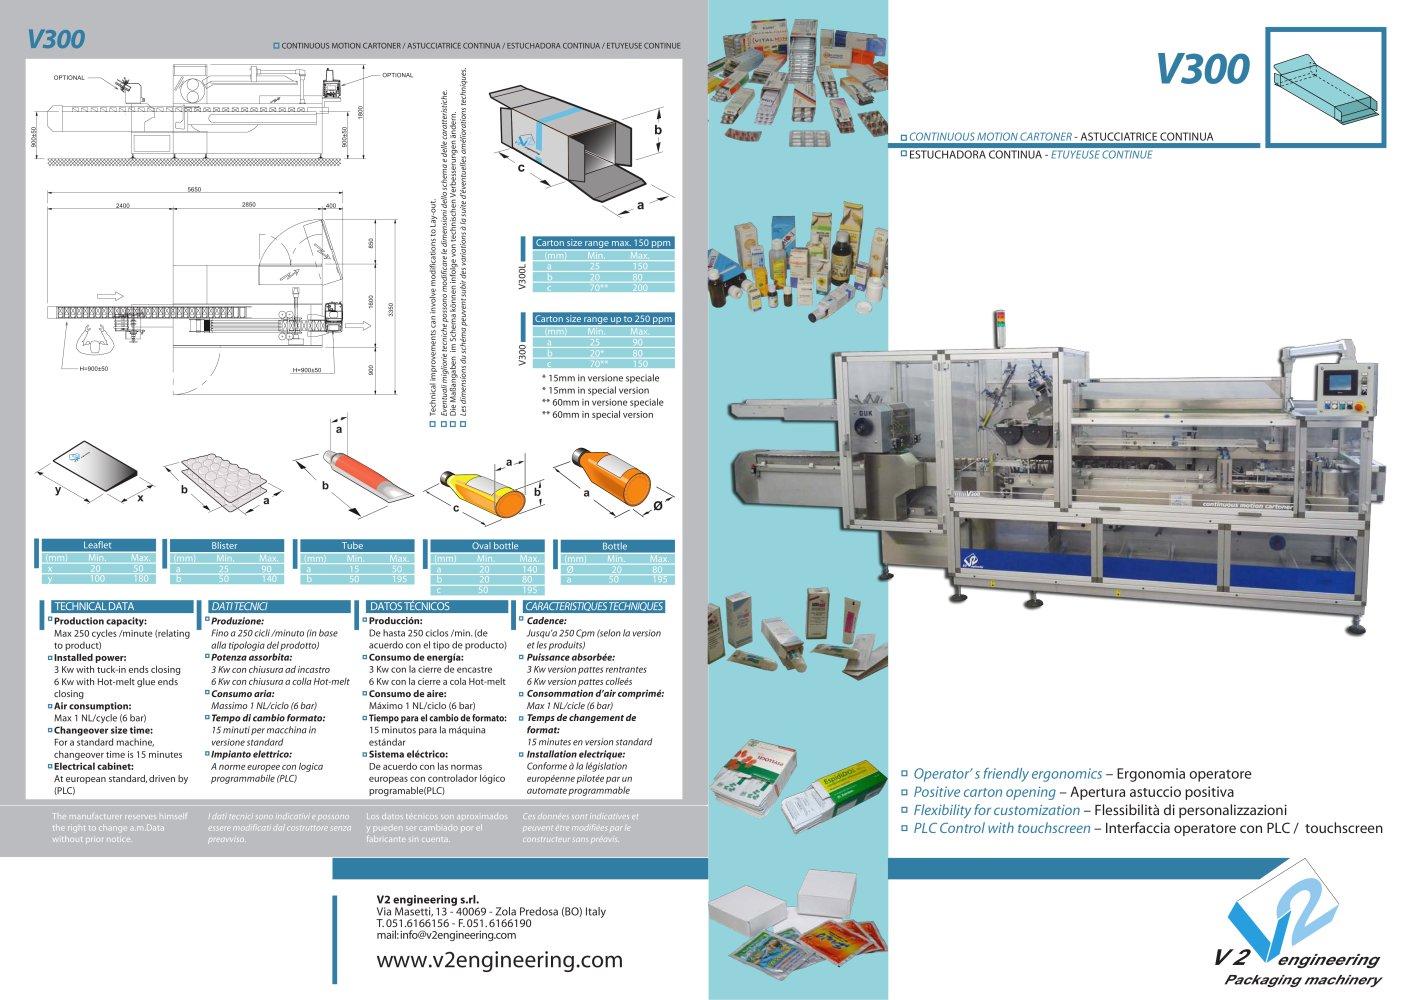 Schema Elettrico Max 250 : V300 v2 engineering pdf catalogue technical documentation